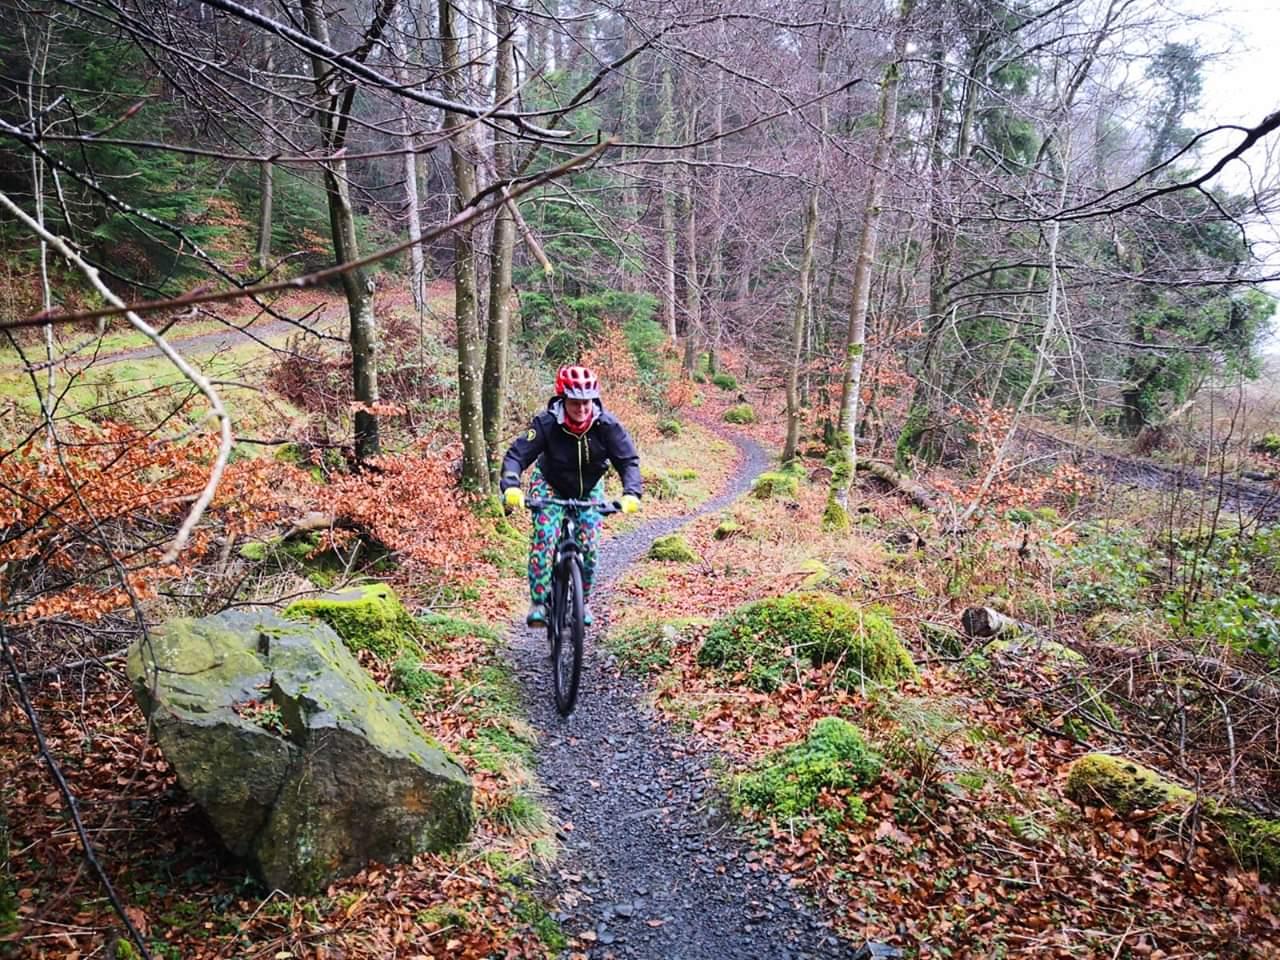 Intro to Bikejor Ayrshire: Week 1